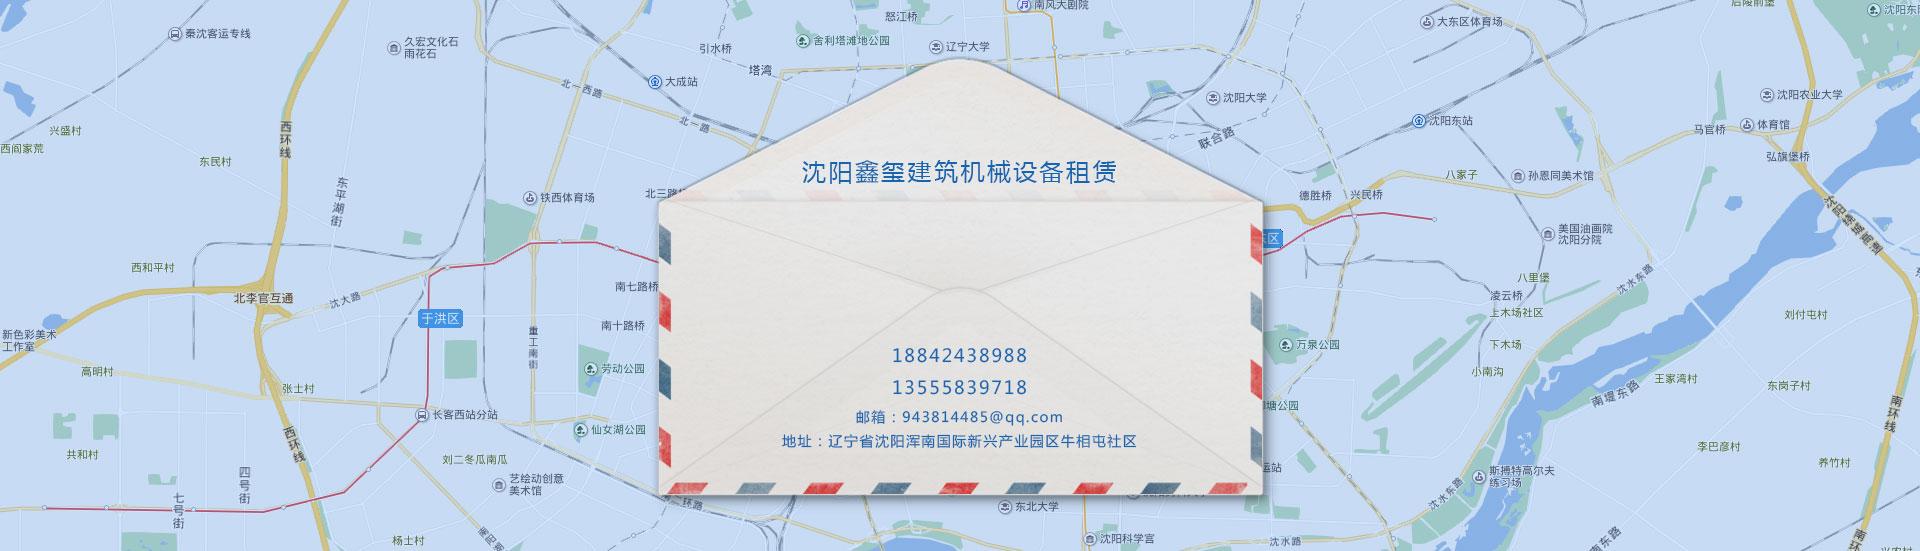 http://files.b2b.cn/skin/2018/0202/9d1b495cc3eecfc1959047f8421d9507.jpg图片